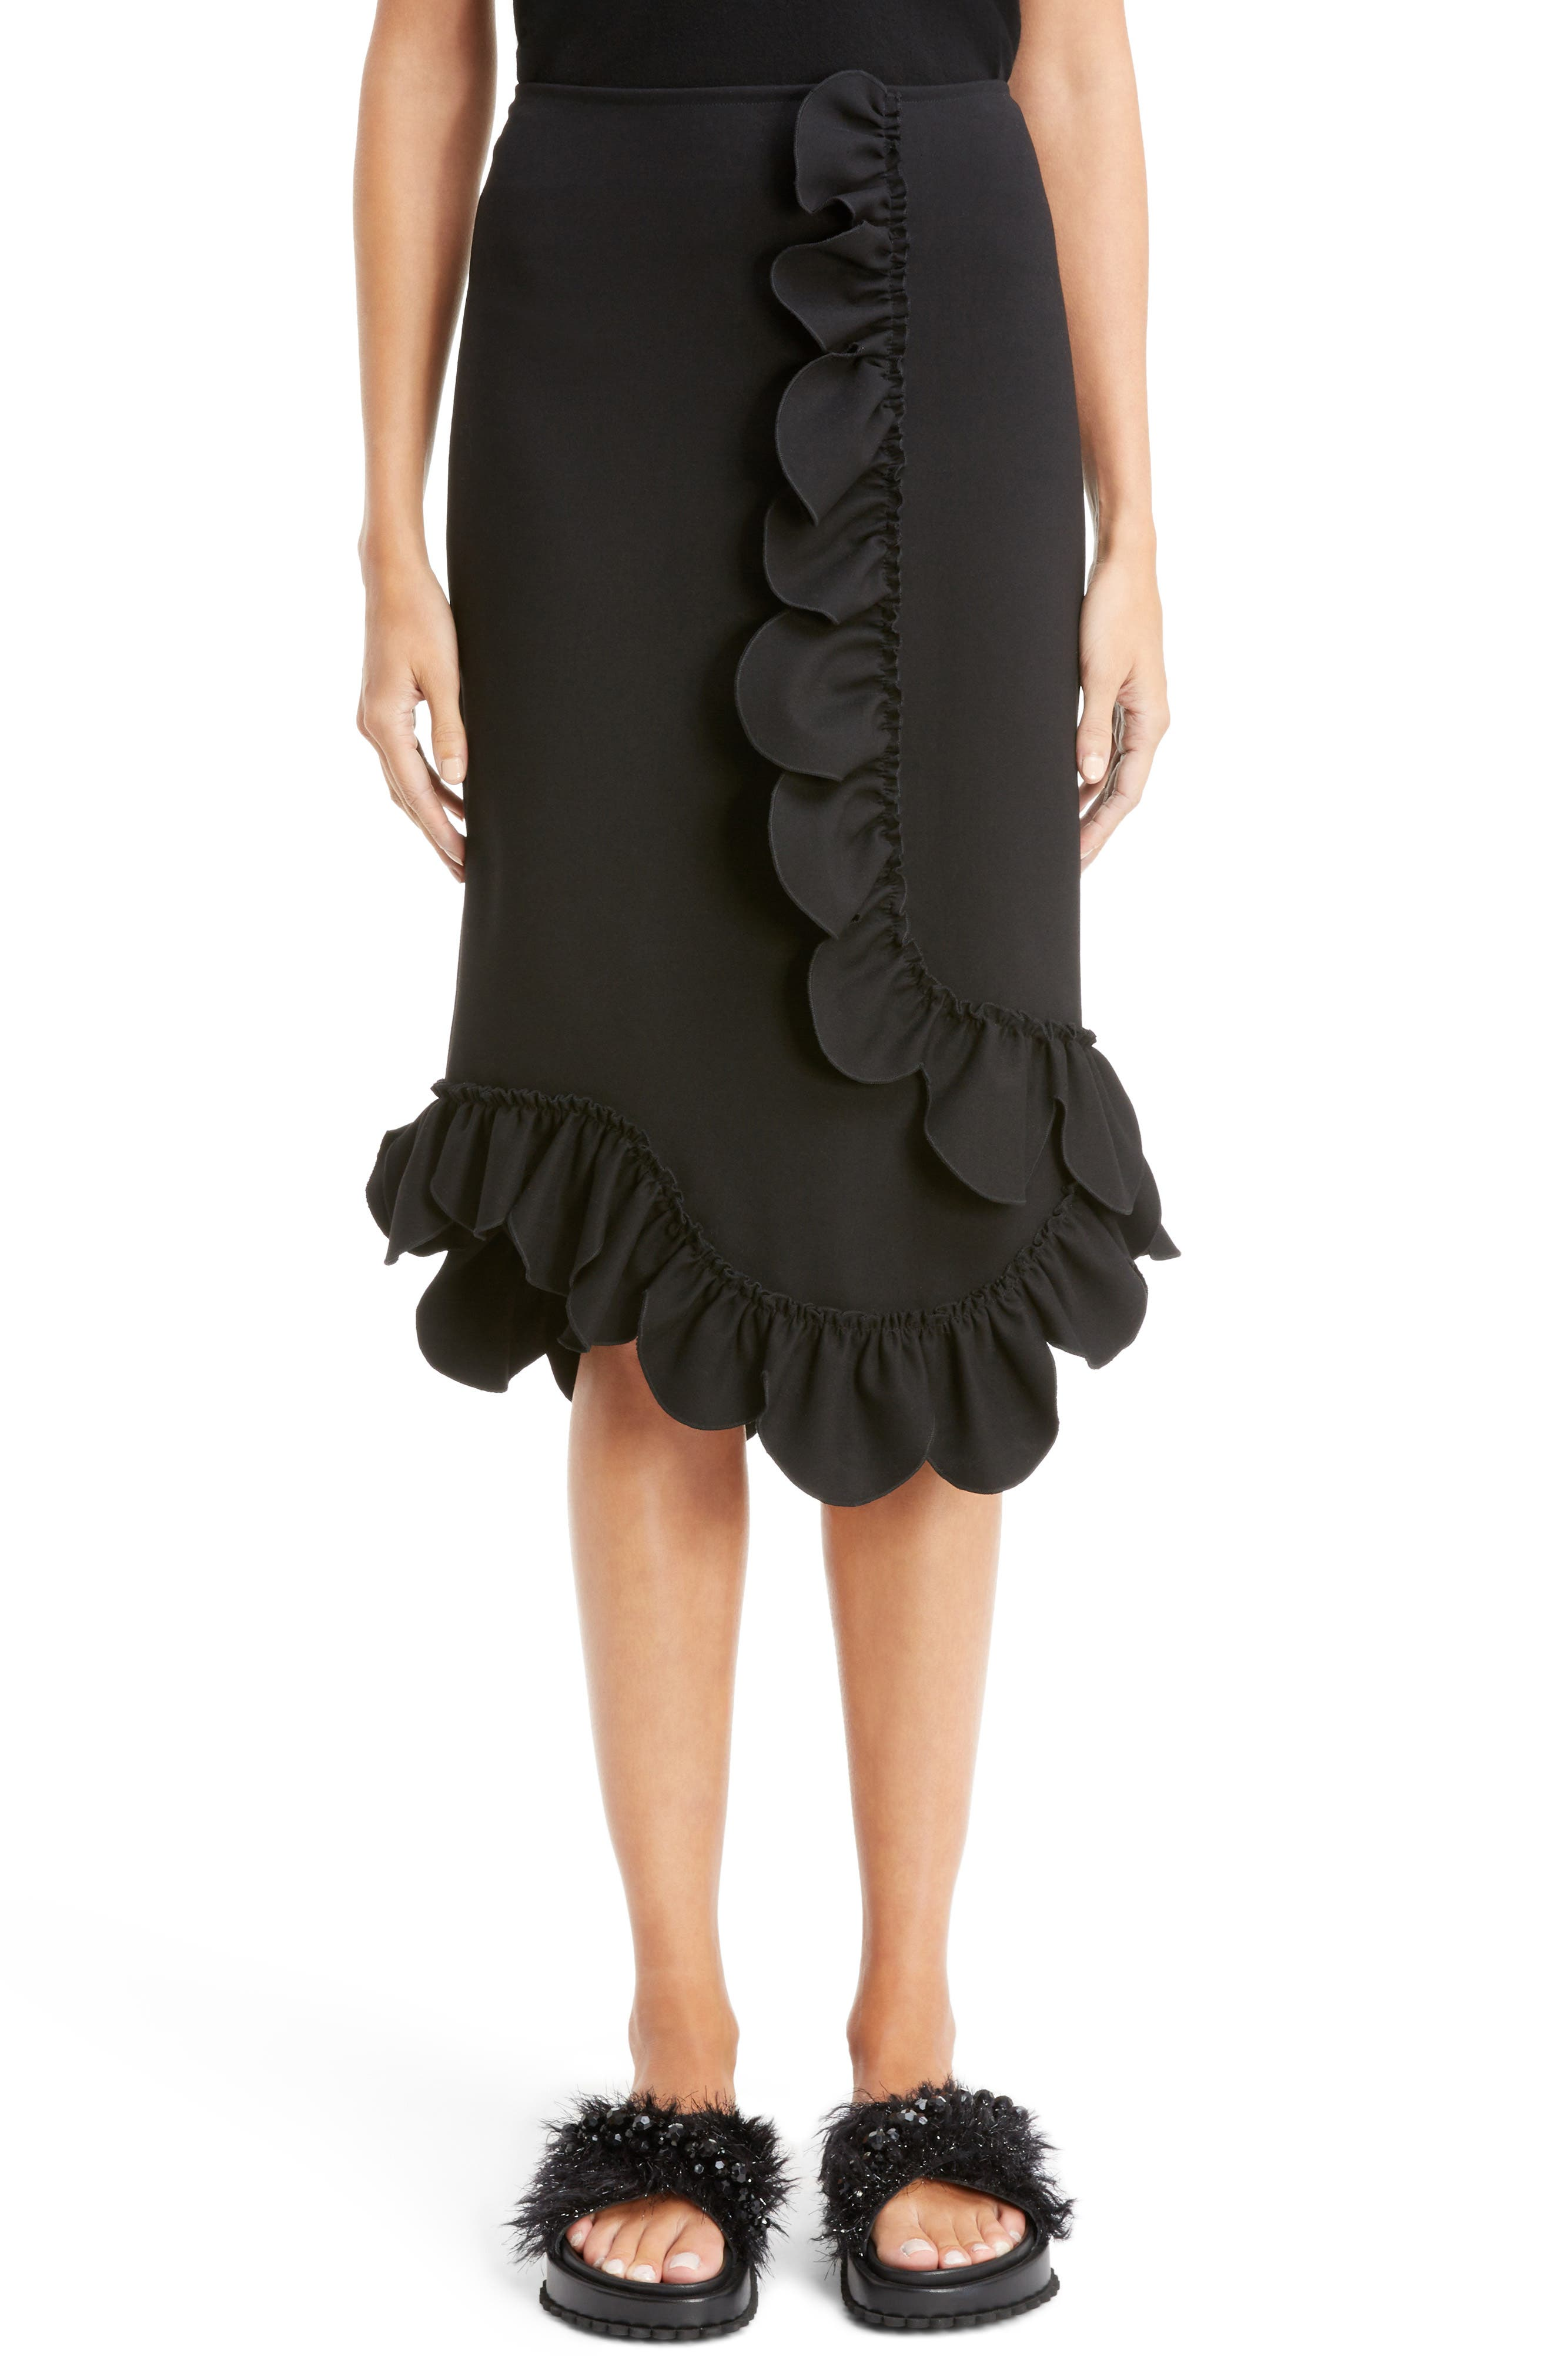 Simone Rocha Asymmetrical Ruffle Skirt